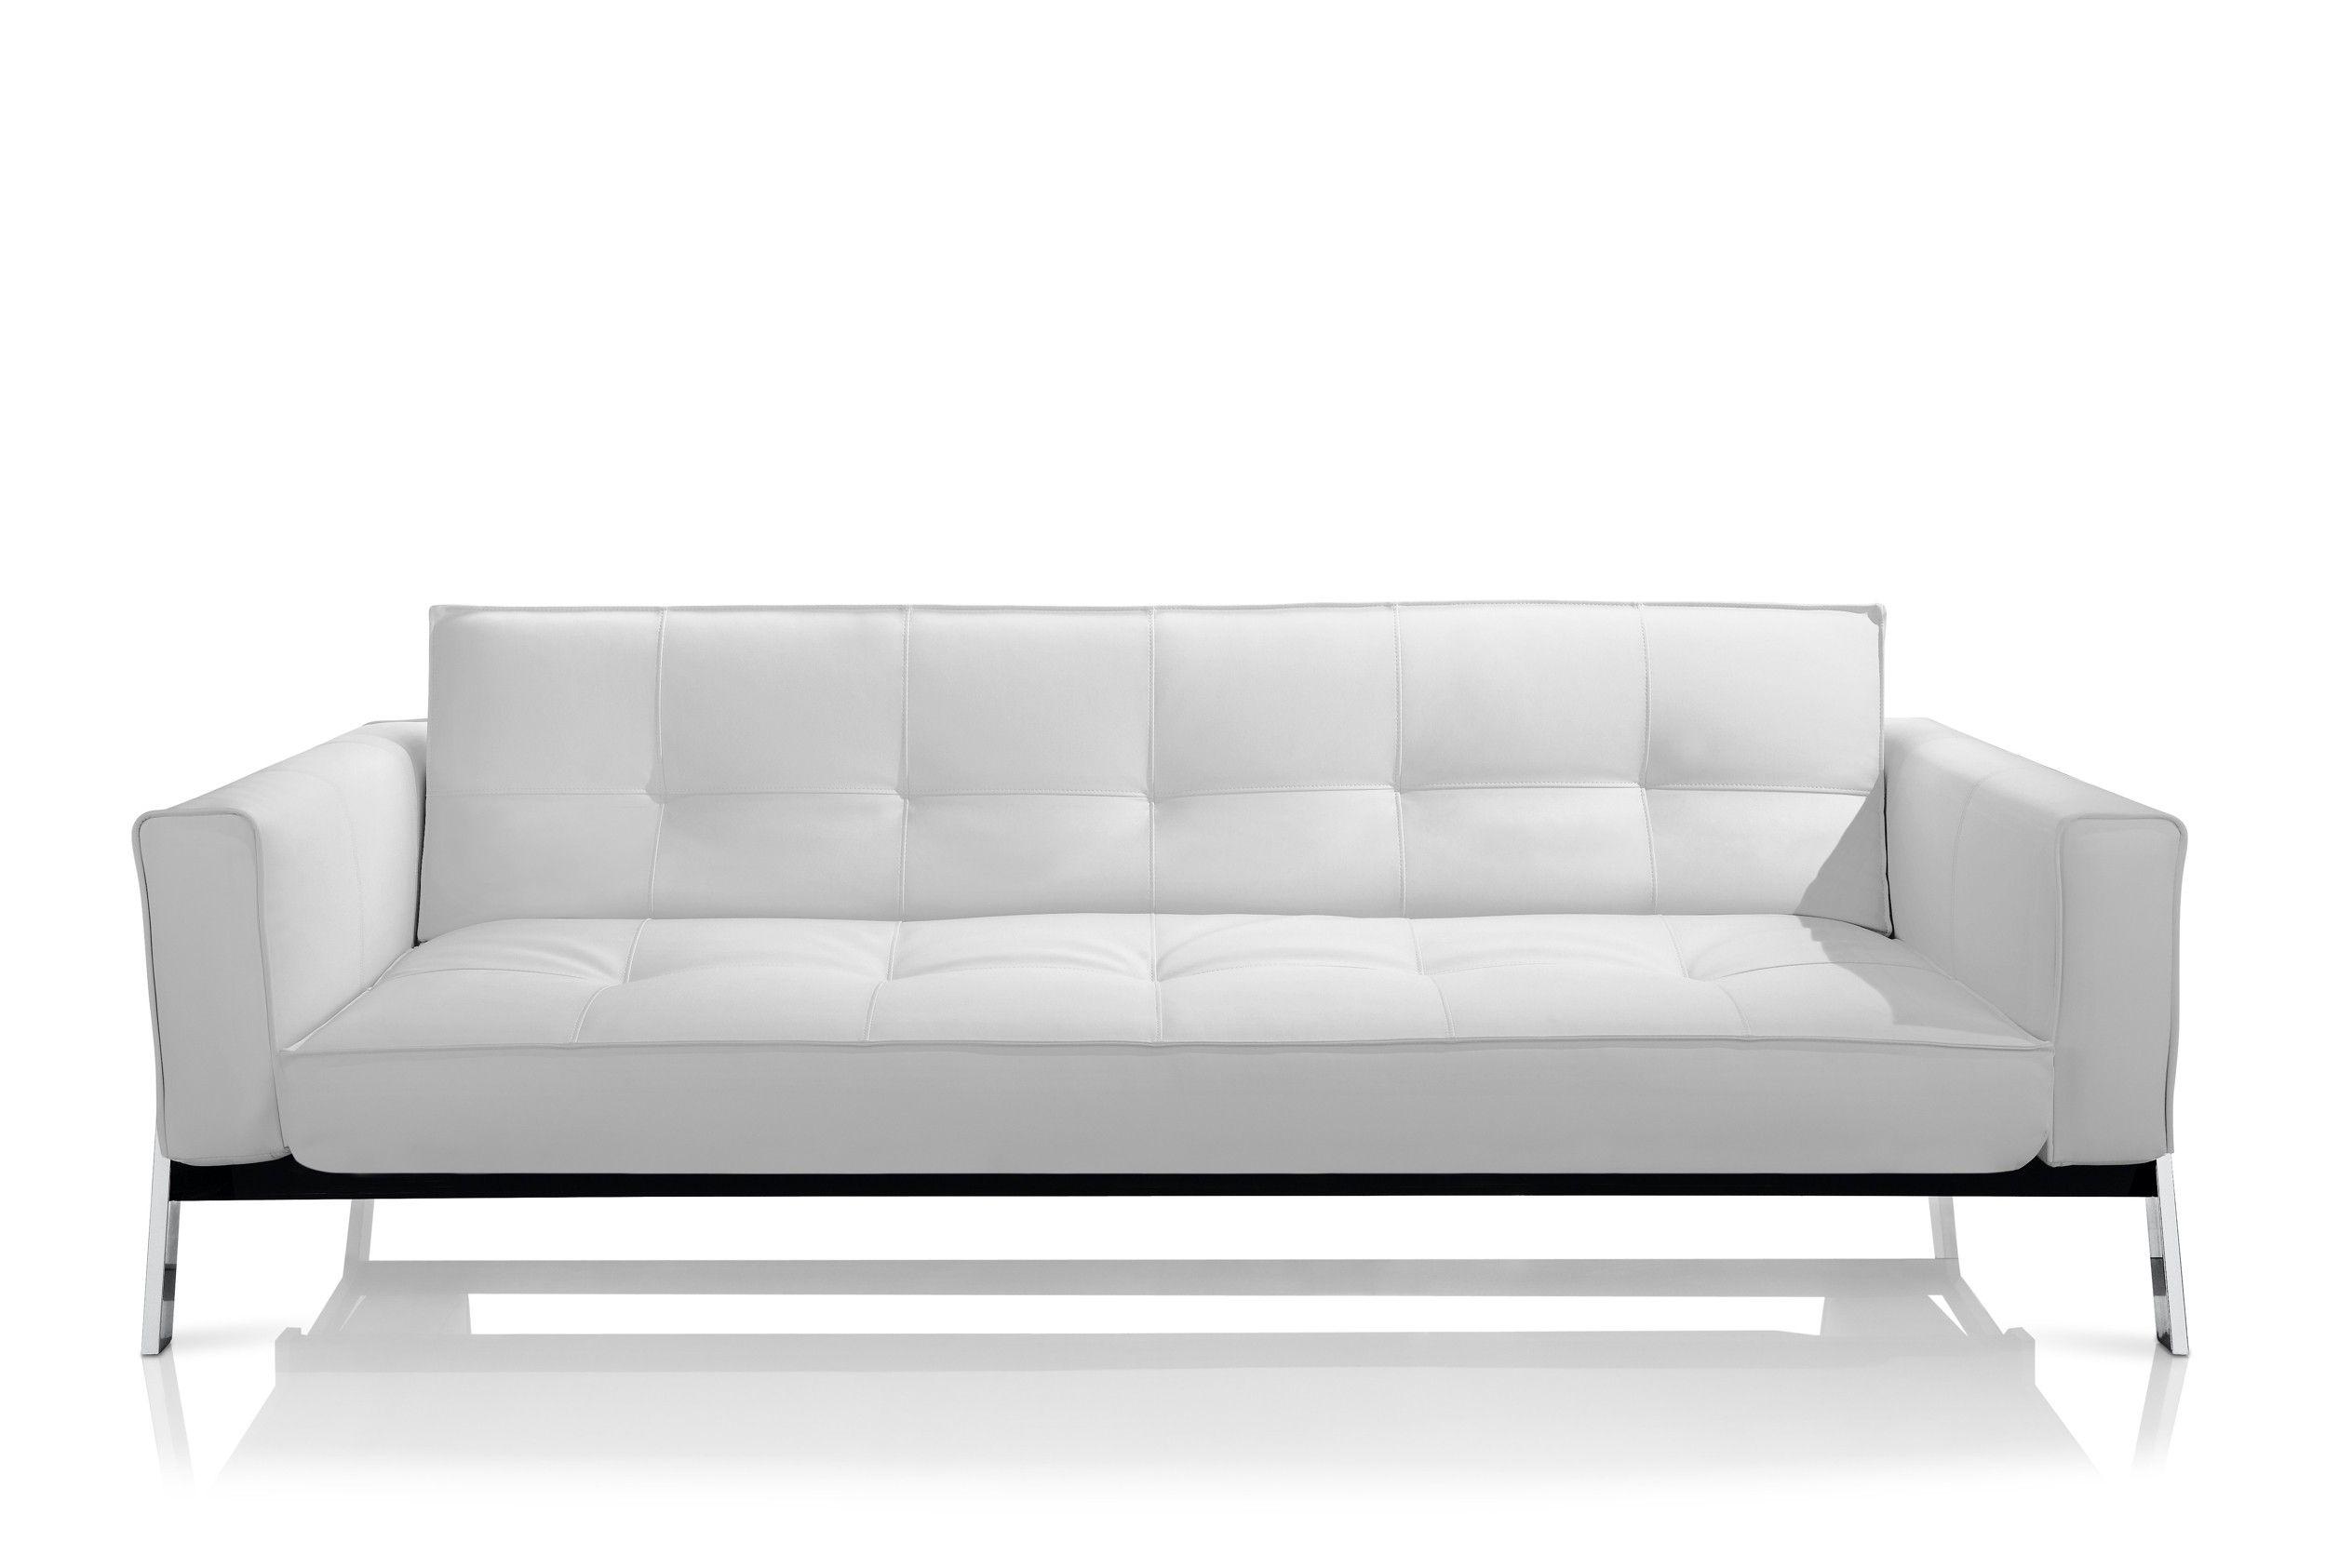 Aria Fabric Modern Sectional Sofa Set Salon Design White Office Pinterest